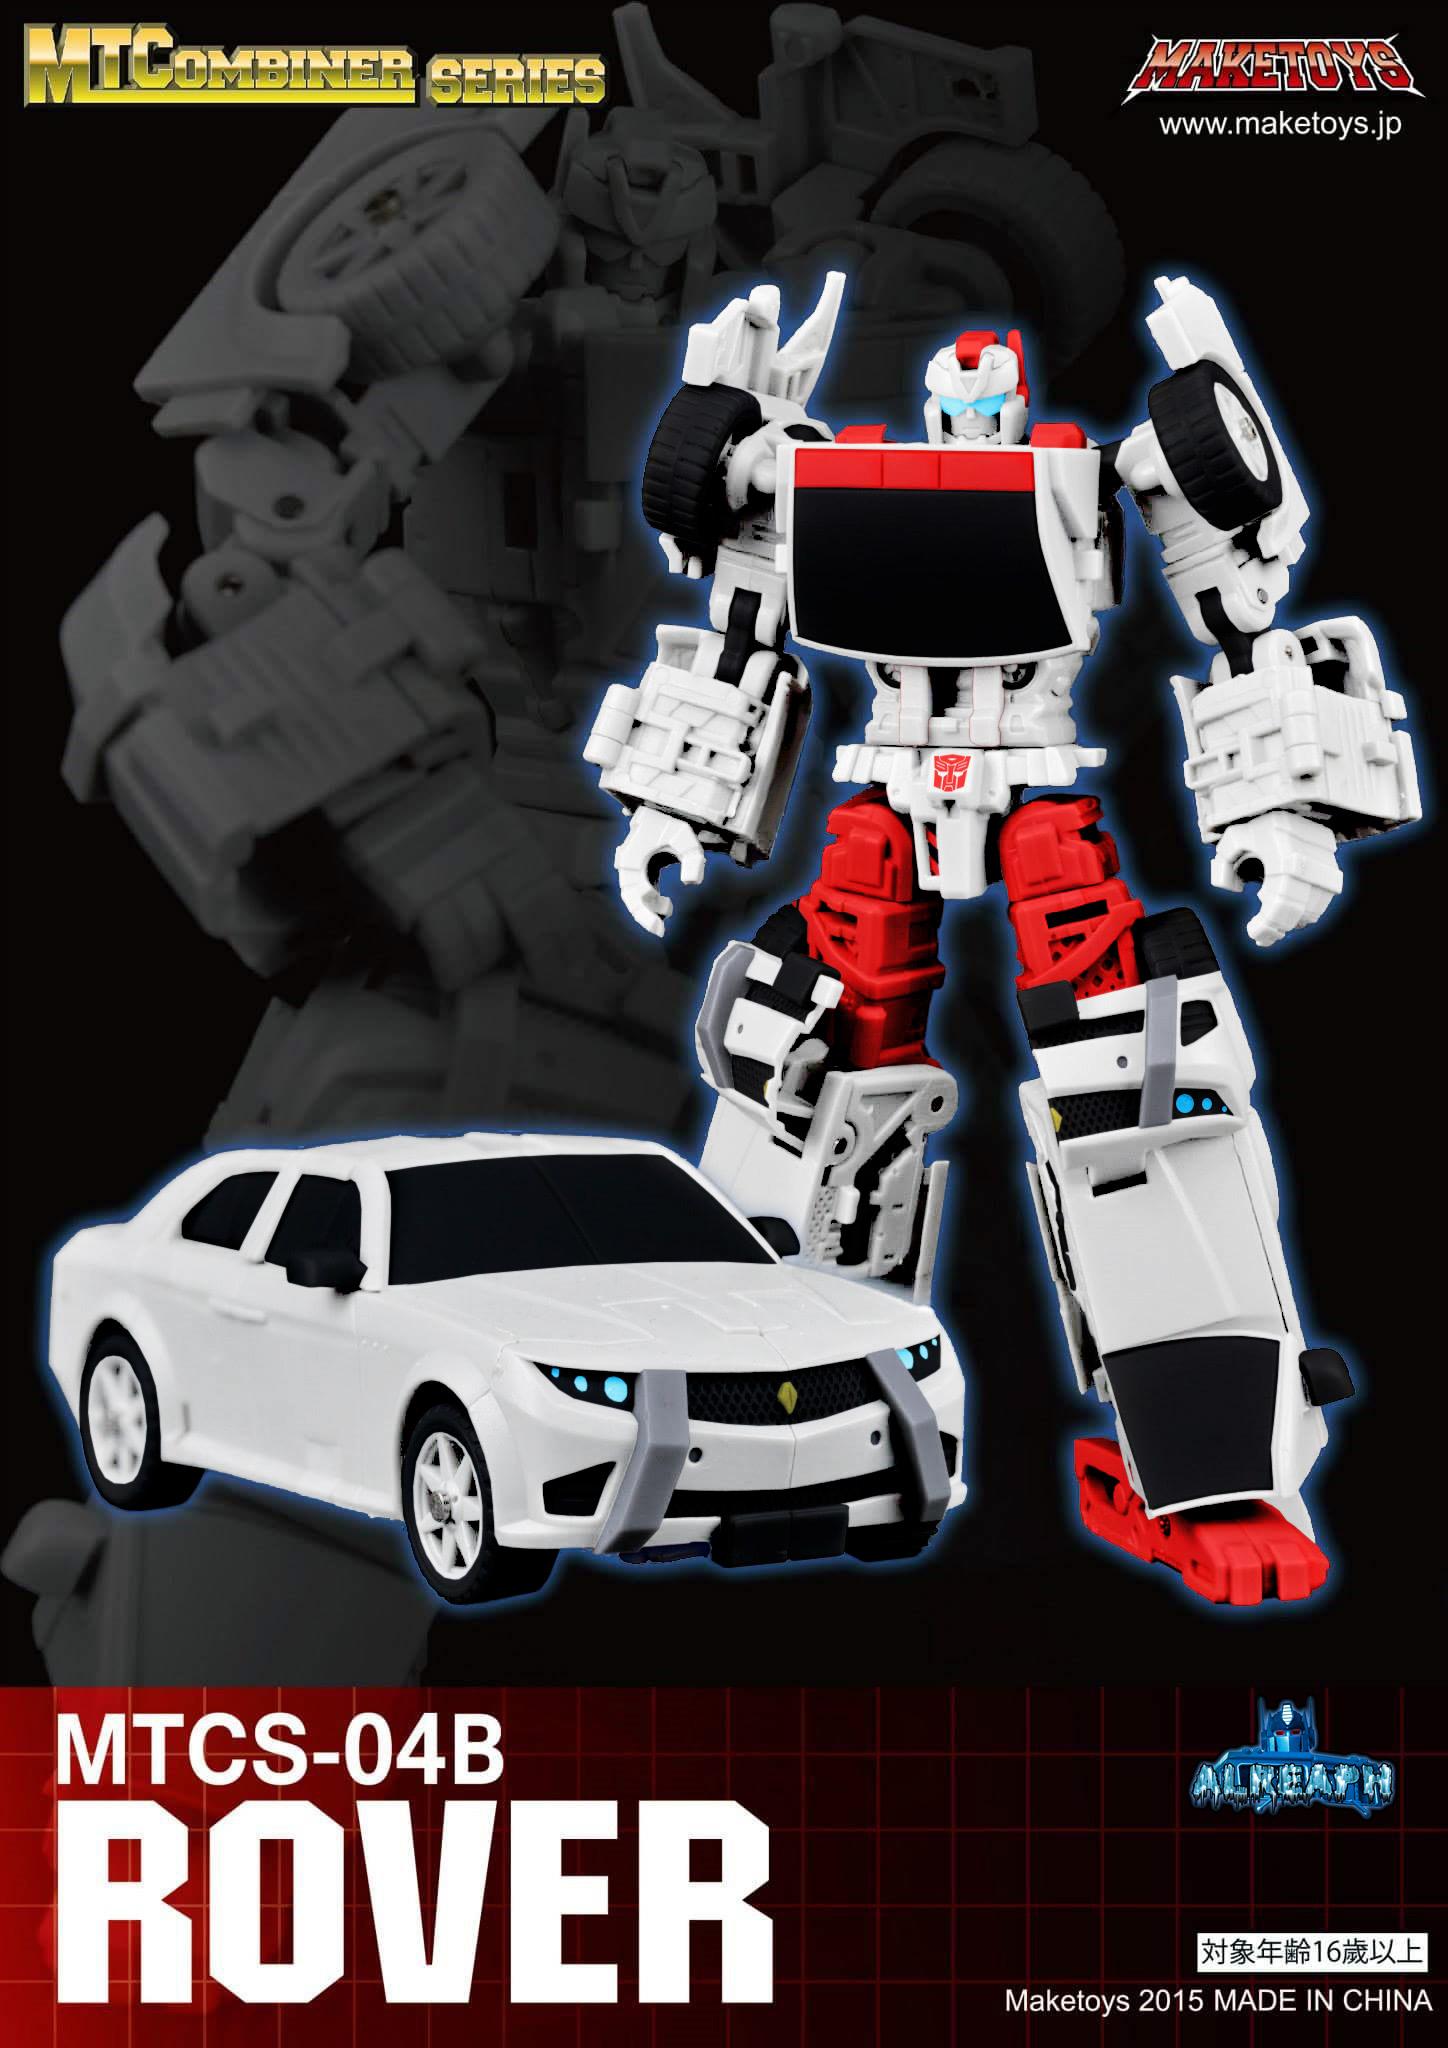 [MakeToys] Produit Tiers - Jouet MTCM-04 Guardia (aka Protectobots - Defensor/Defenso) VTaD3GQ2